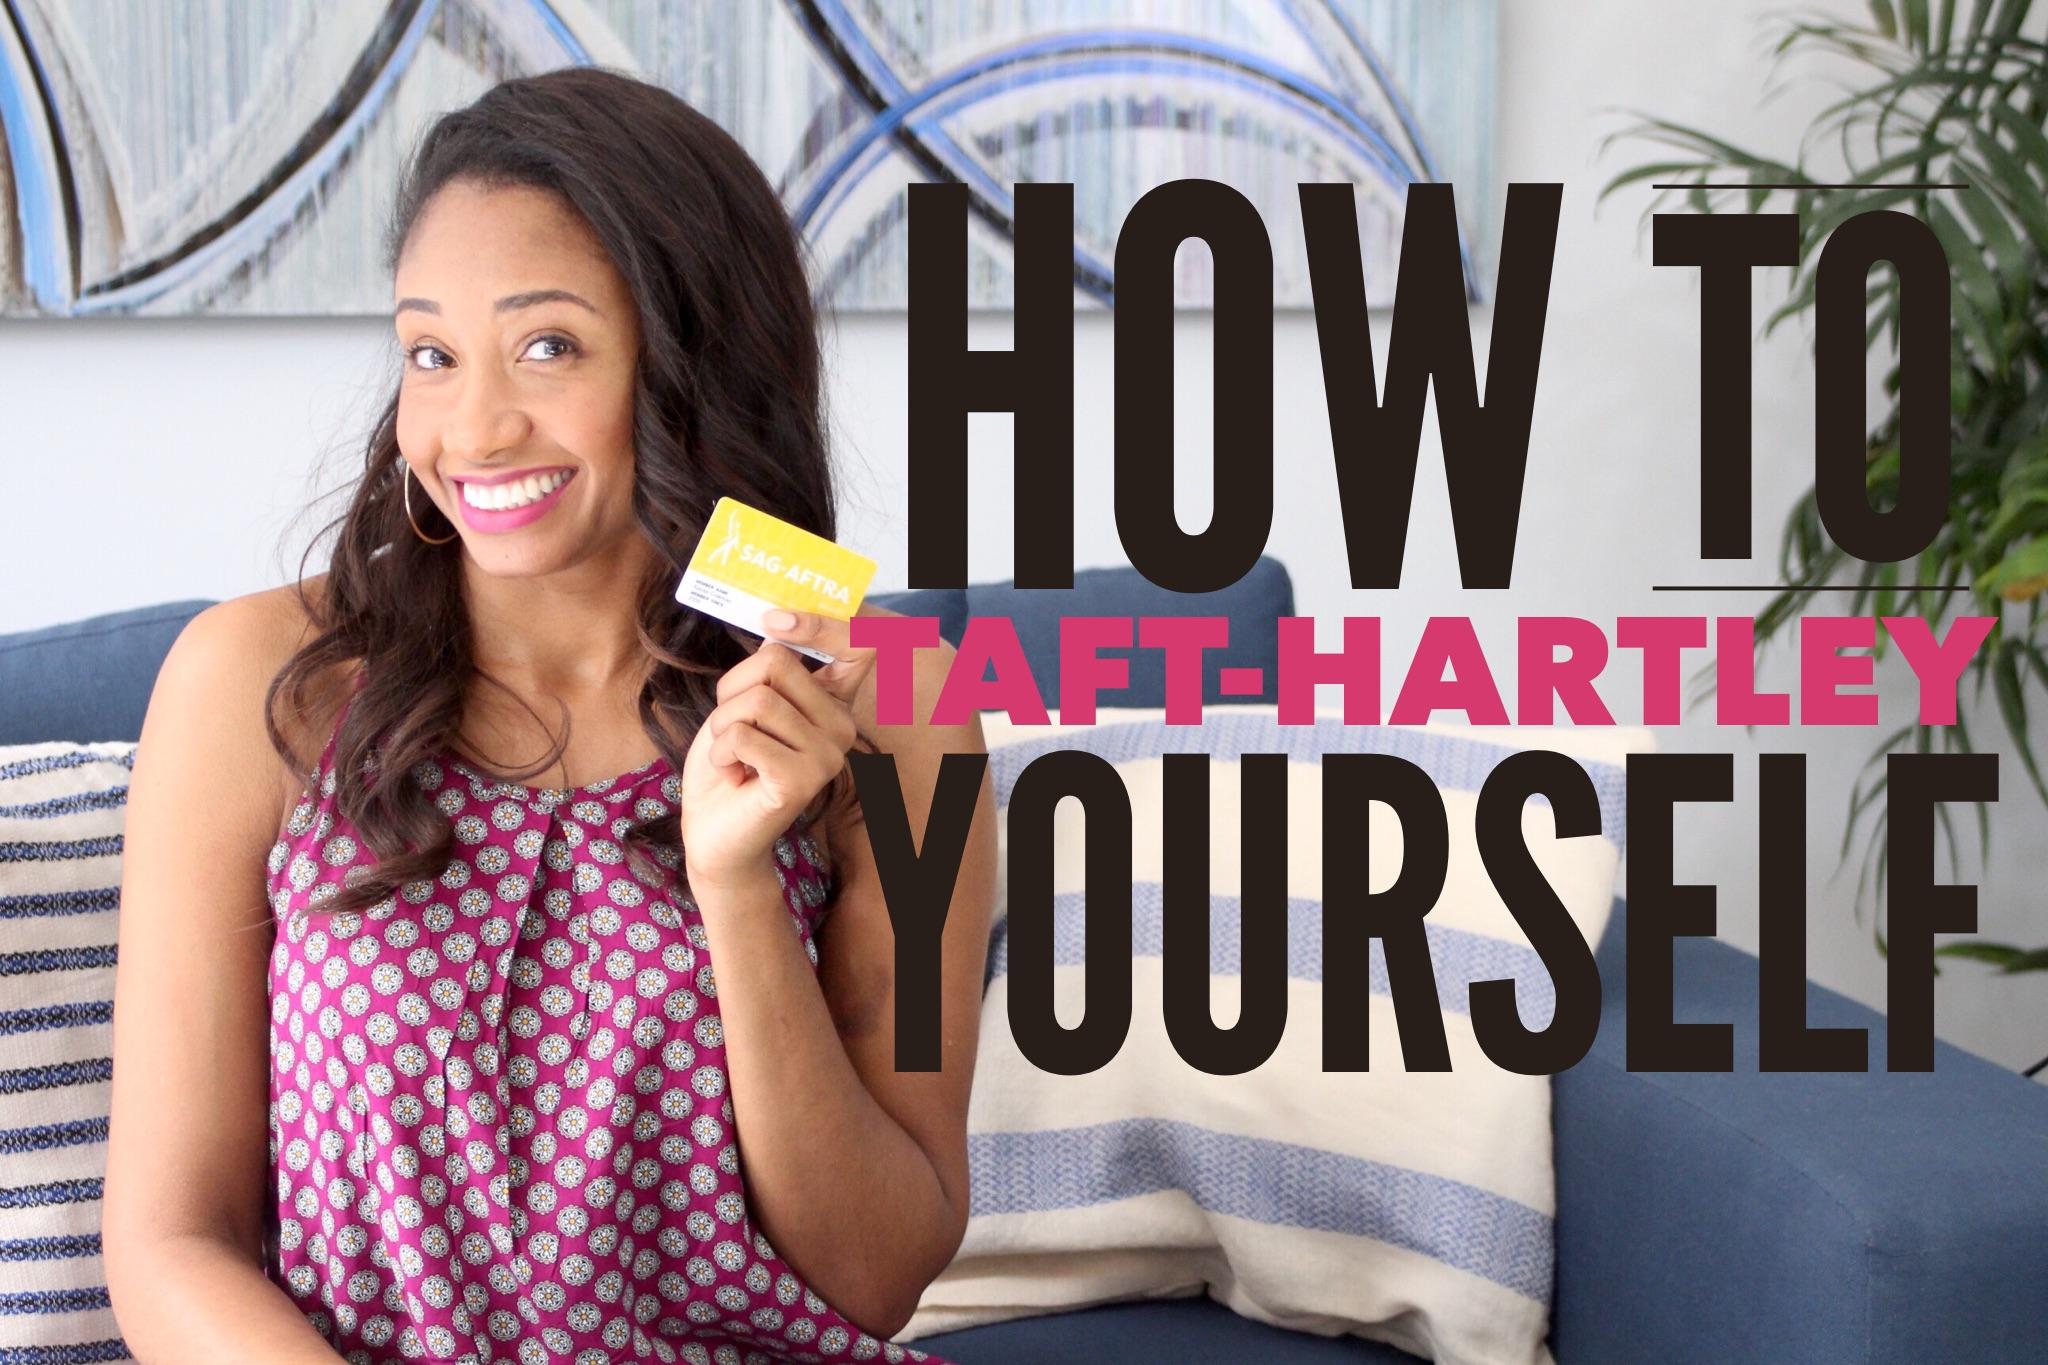 How To Taft-Hartley Yourself | The Workshop Guru